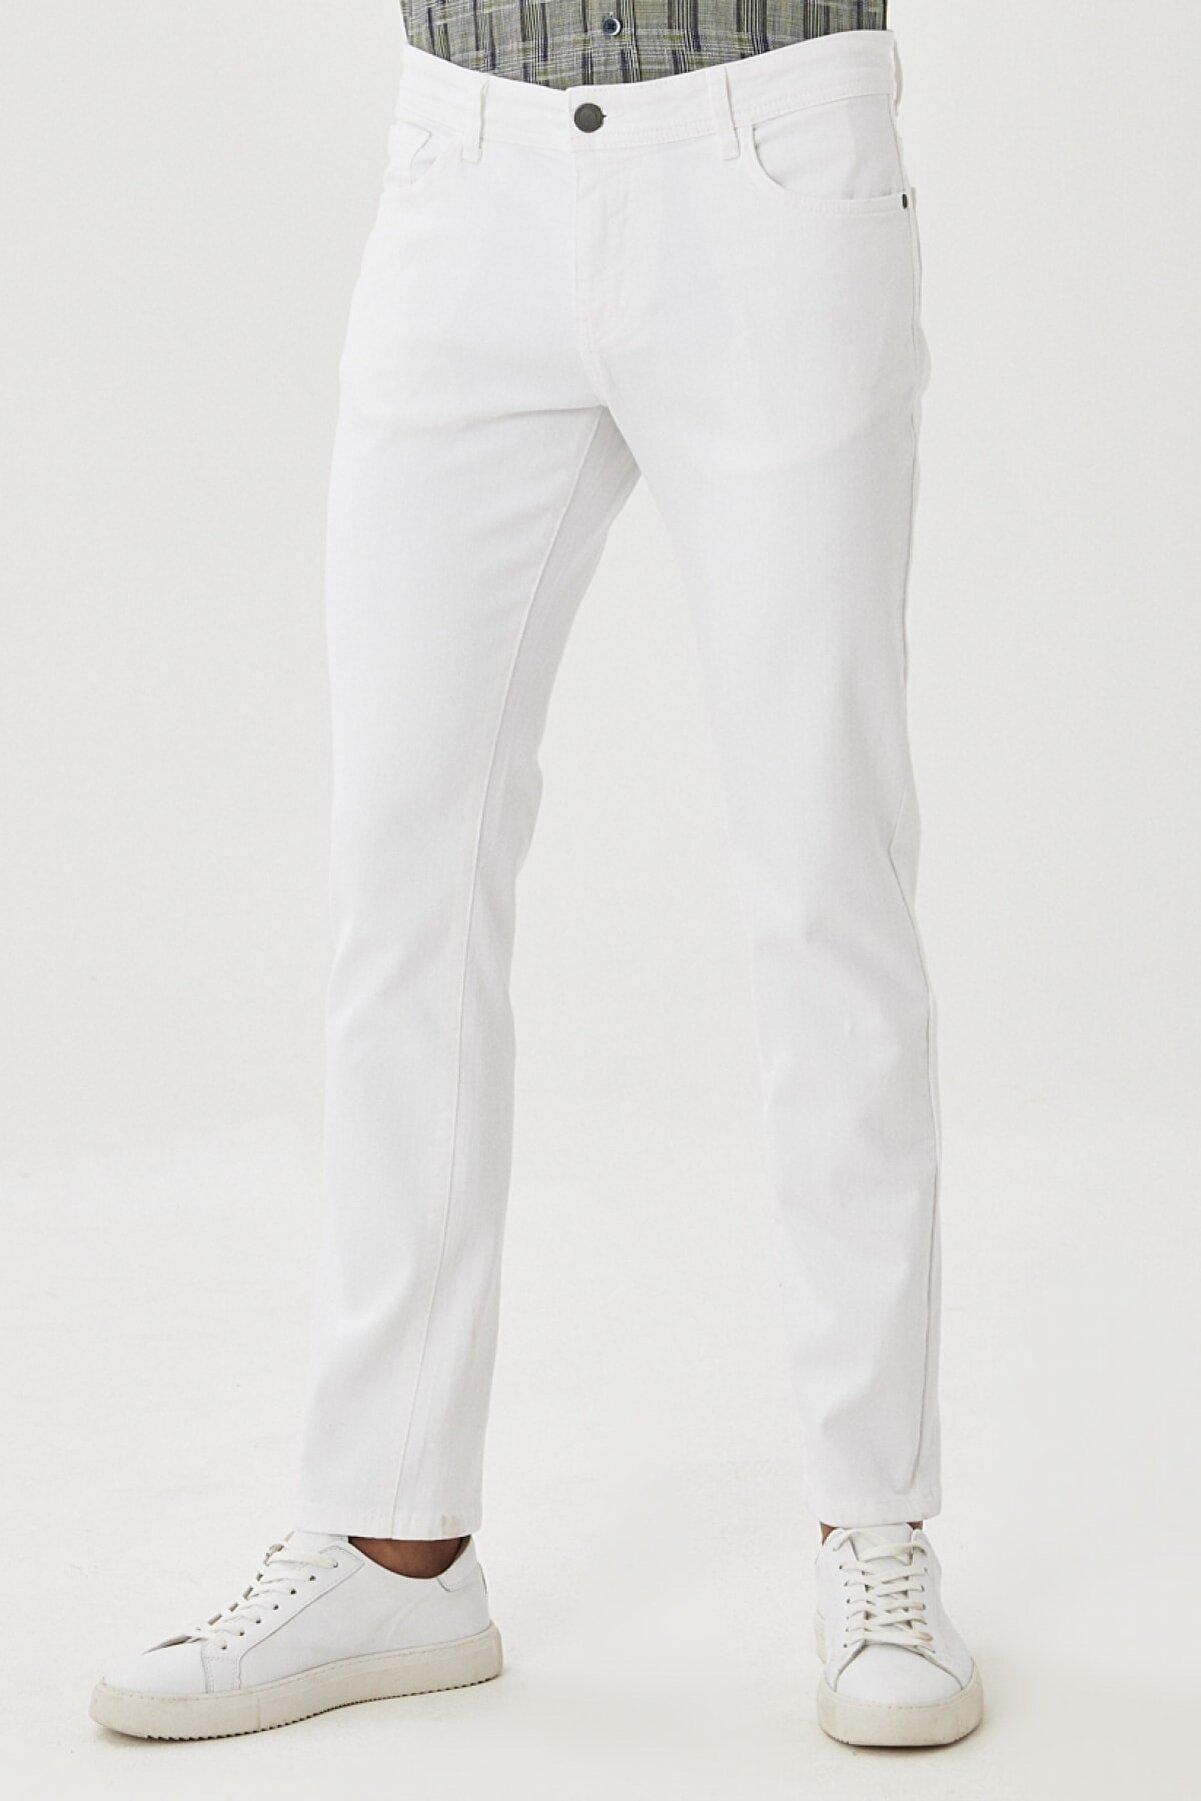 Altınyıldız Classics Erkek Beyaz 360 Derece Her Yöne Esneyen Rahat Slim Fit Pantolon